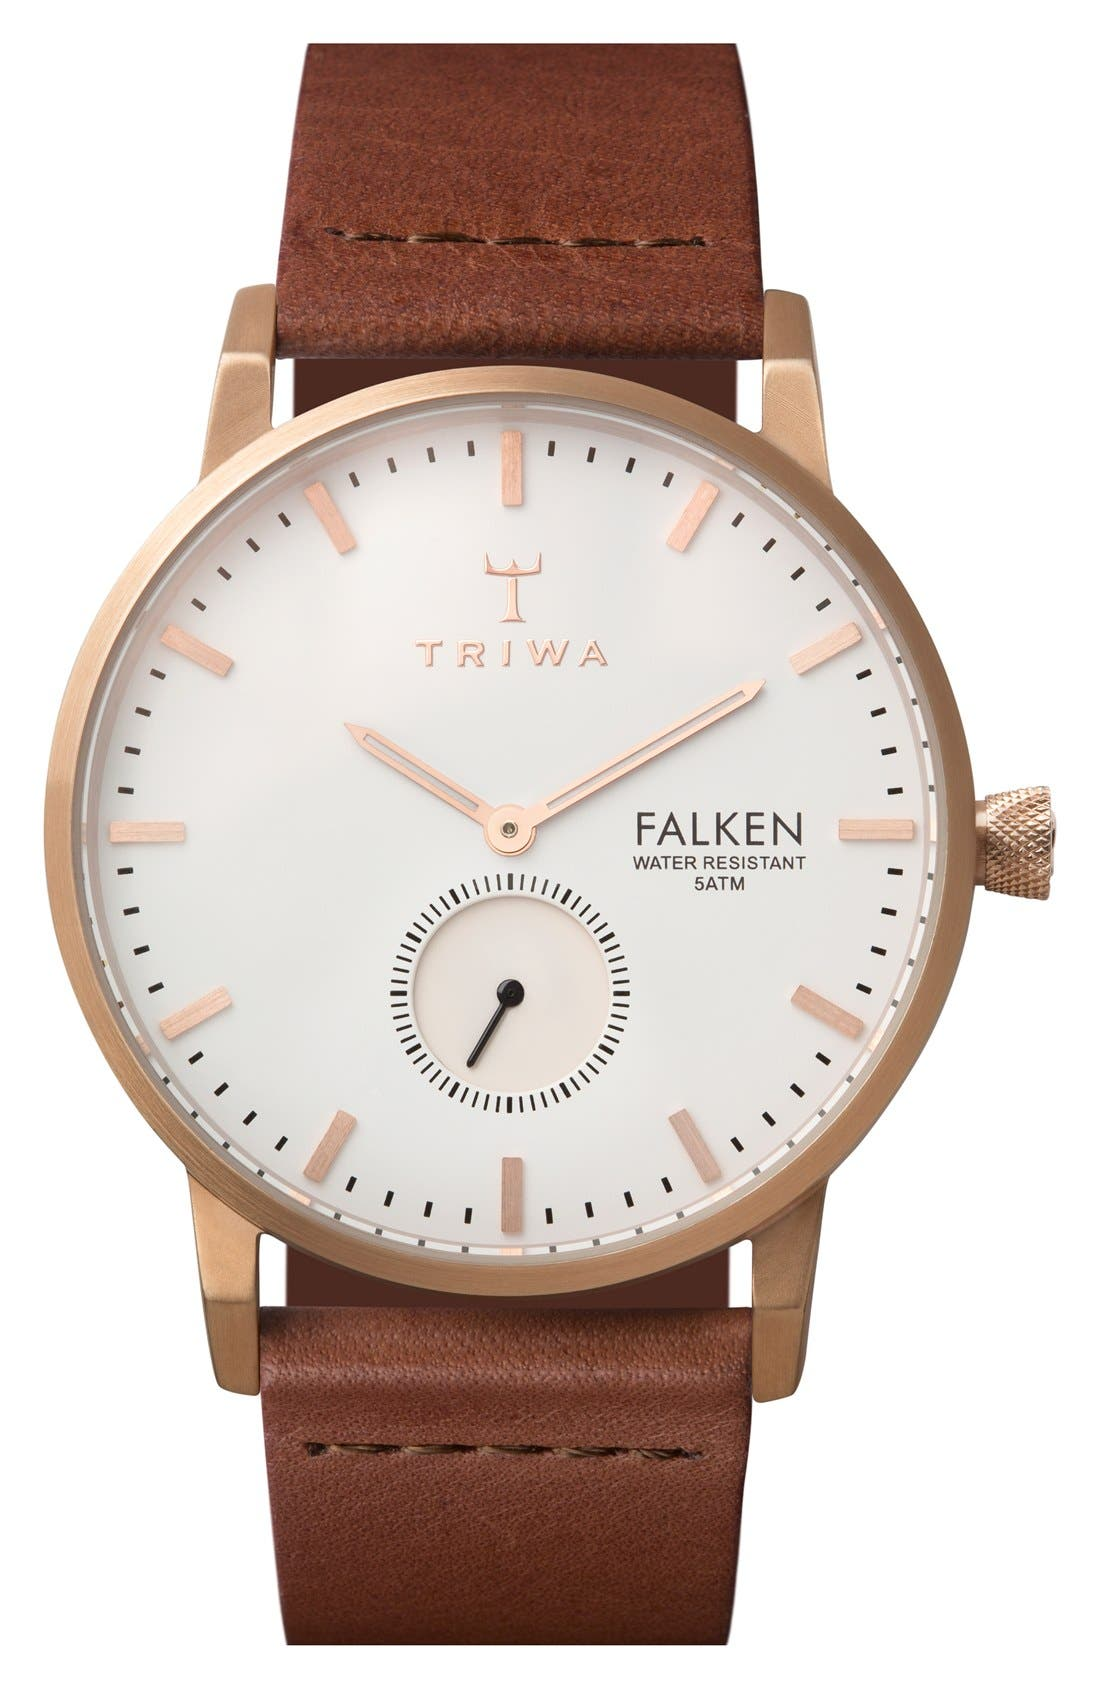 Main Image - TRIWA Falken Organic Leather Strap Watch, 38mm